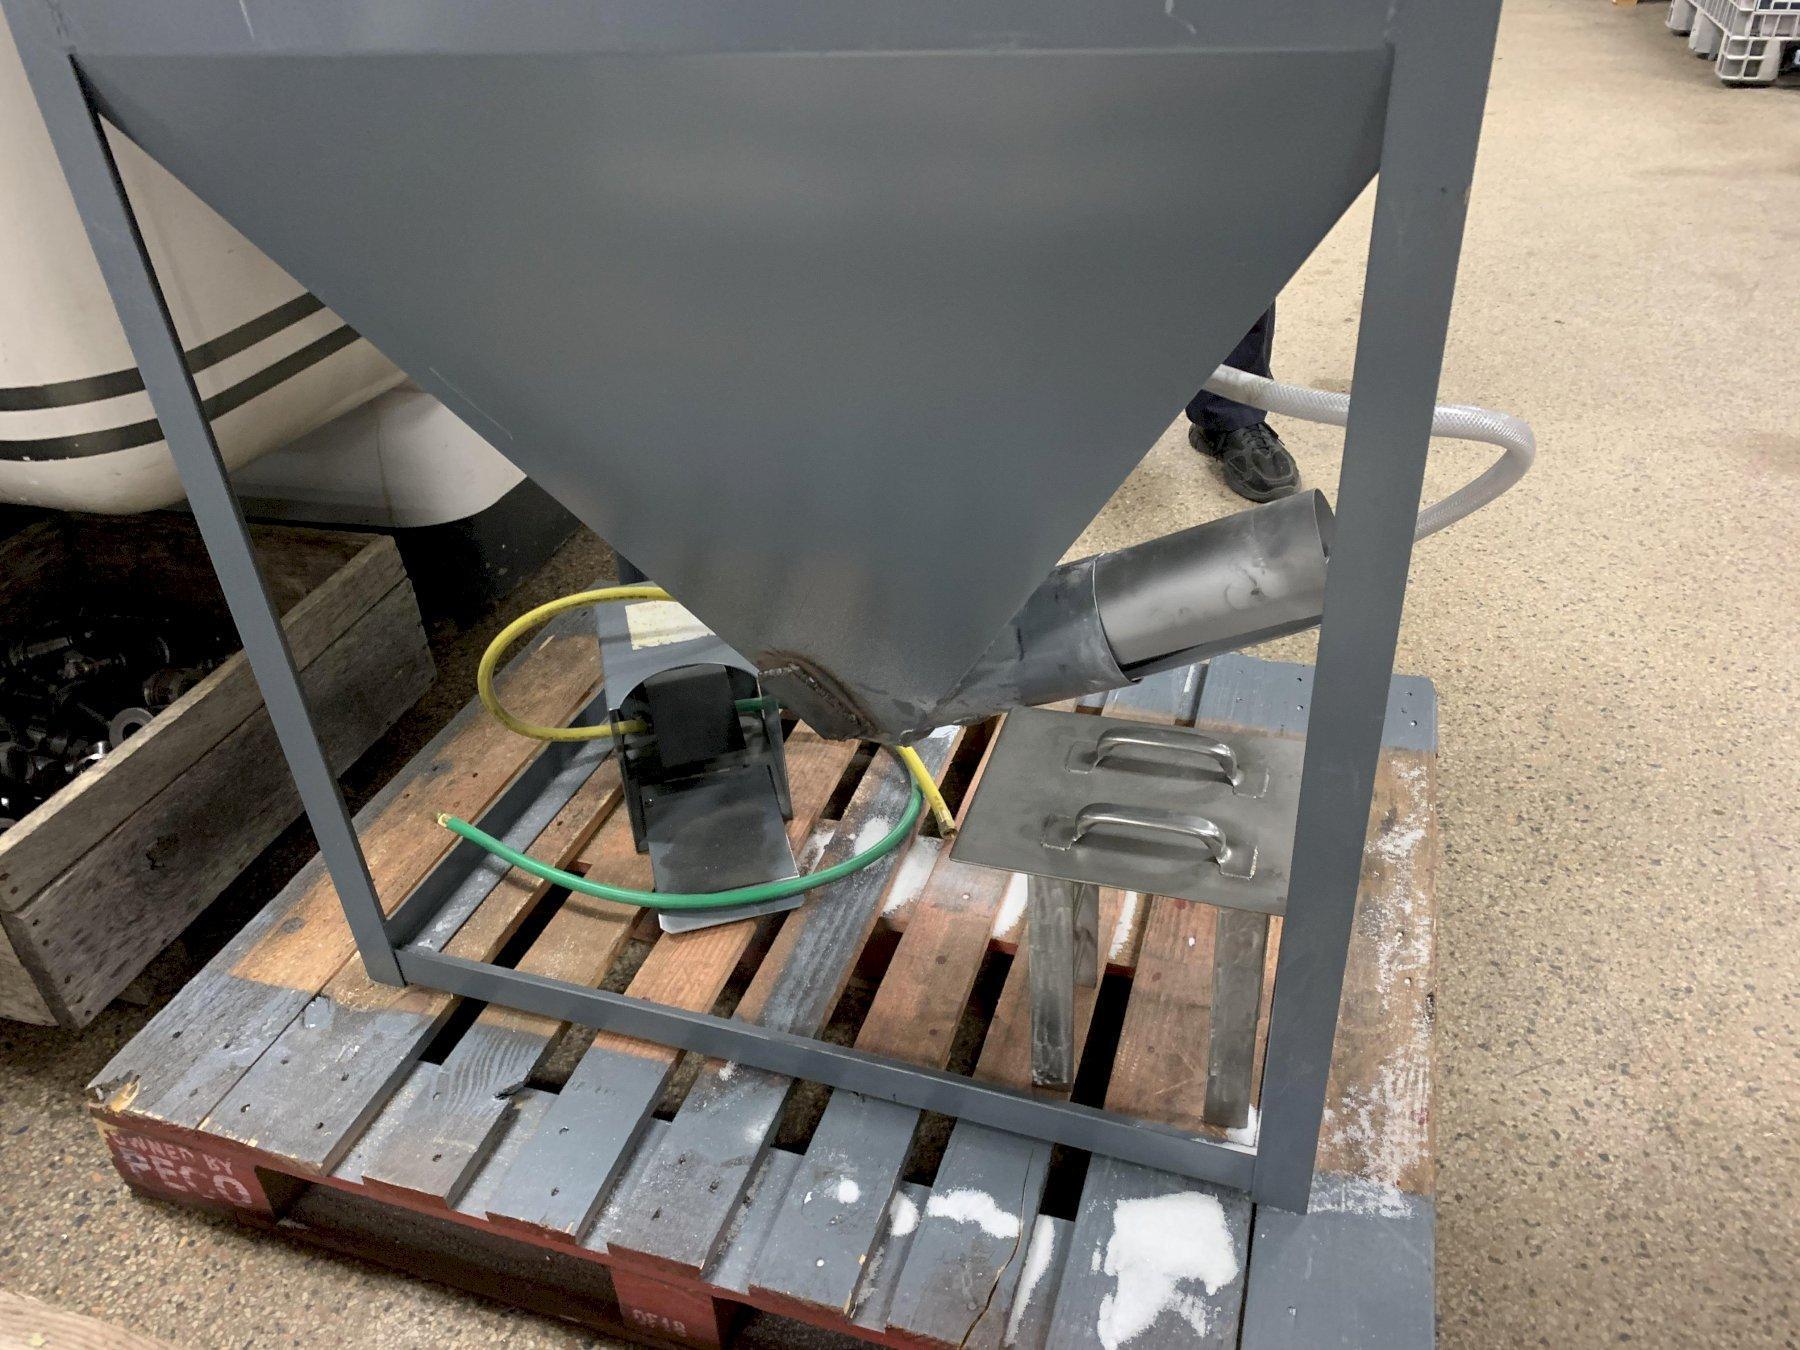 Trinco / Trinity 48 x 36 Dry Blast Cabinet Model 36/600RC, S/N 74996-15